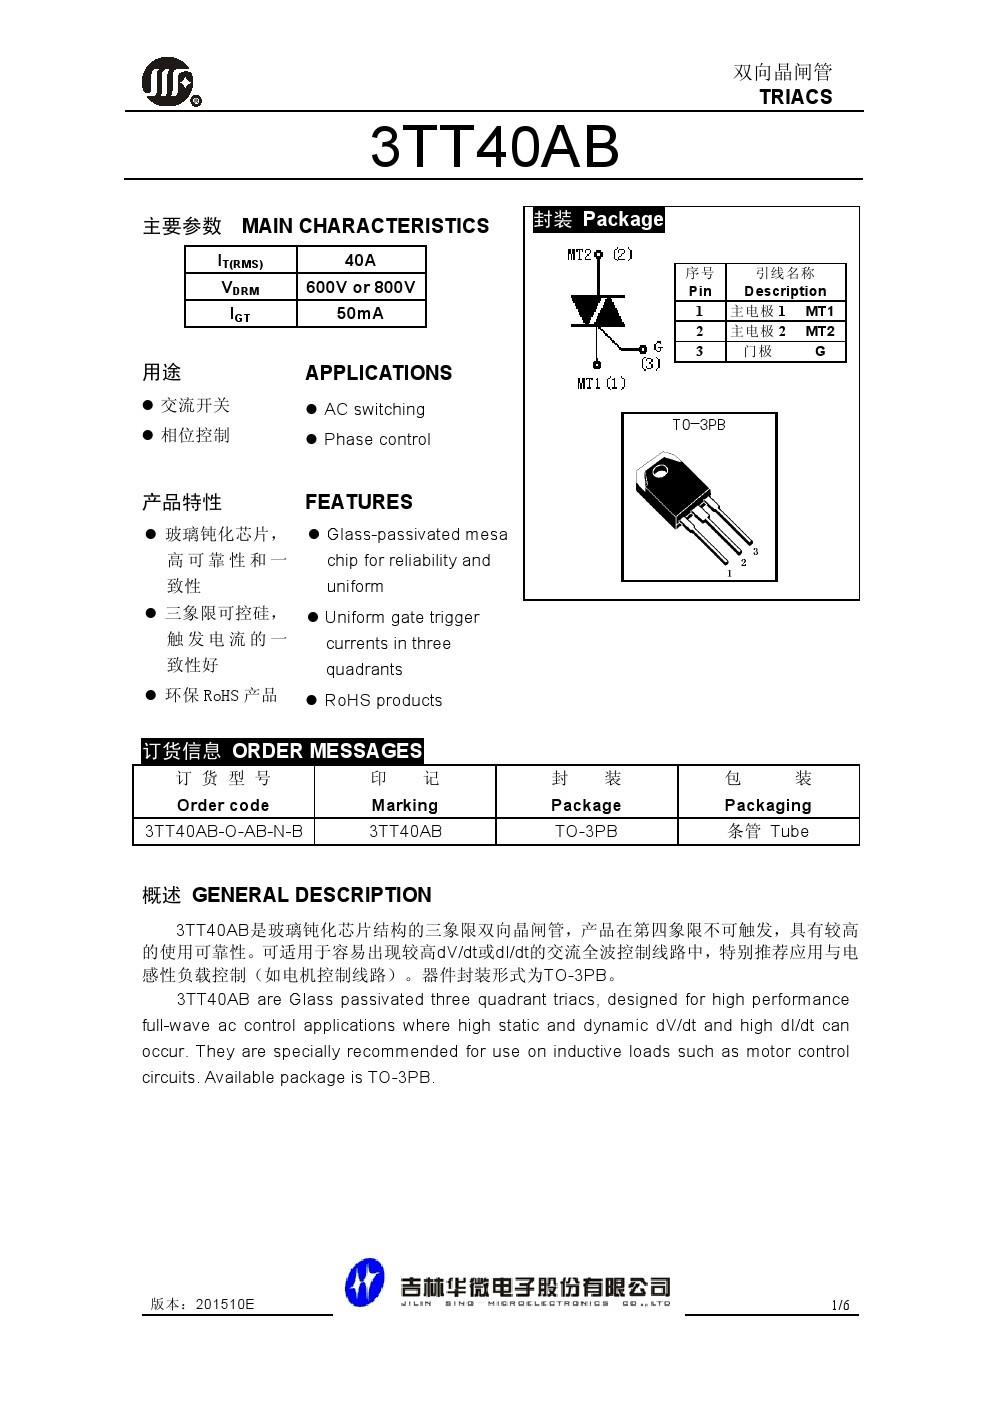 3tt40ab Triac 40a 800v Triode Ac Semiconductor Switch 40a800v Buy Characteristics Product Description